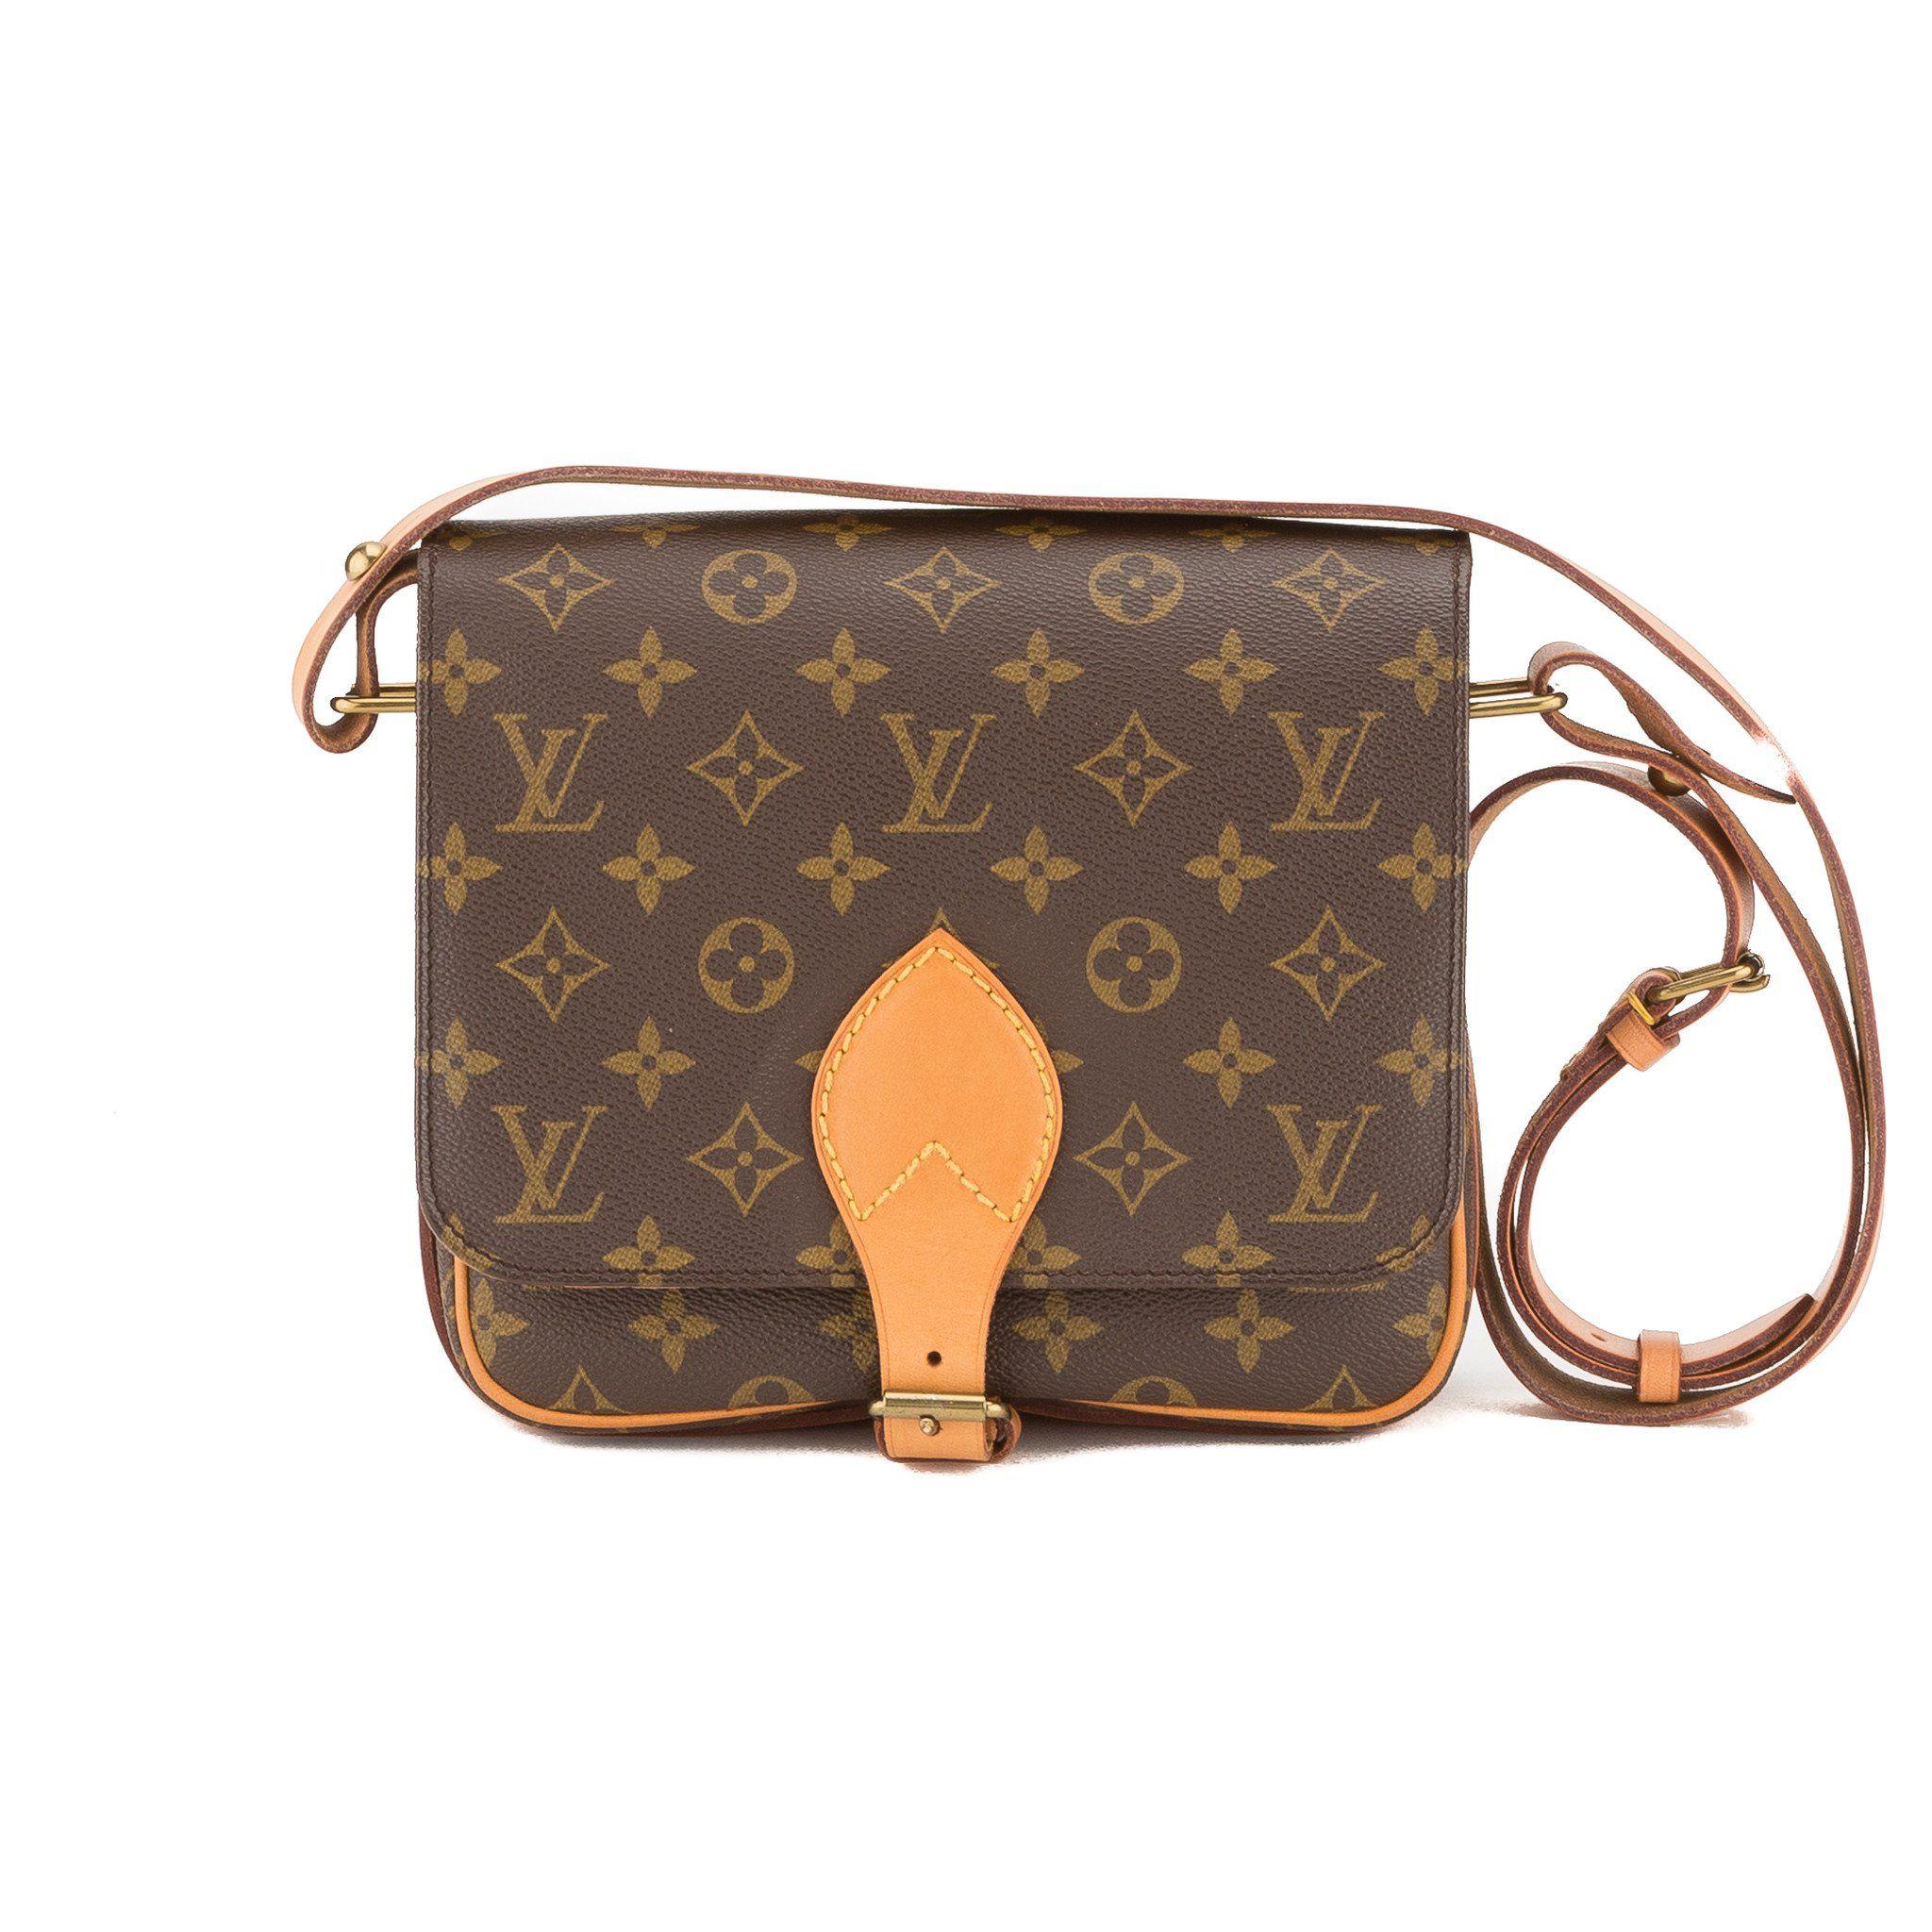 e3ca6f5e98 Louis Vuitton Monogram Cartouchiere Shoulder Bag (Pre Owned ...